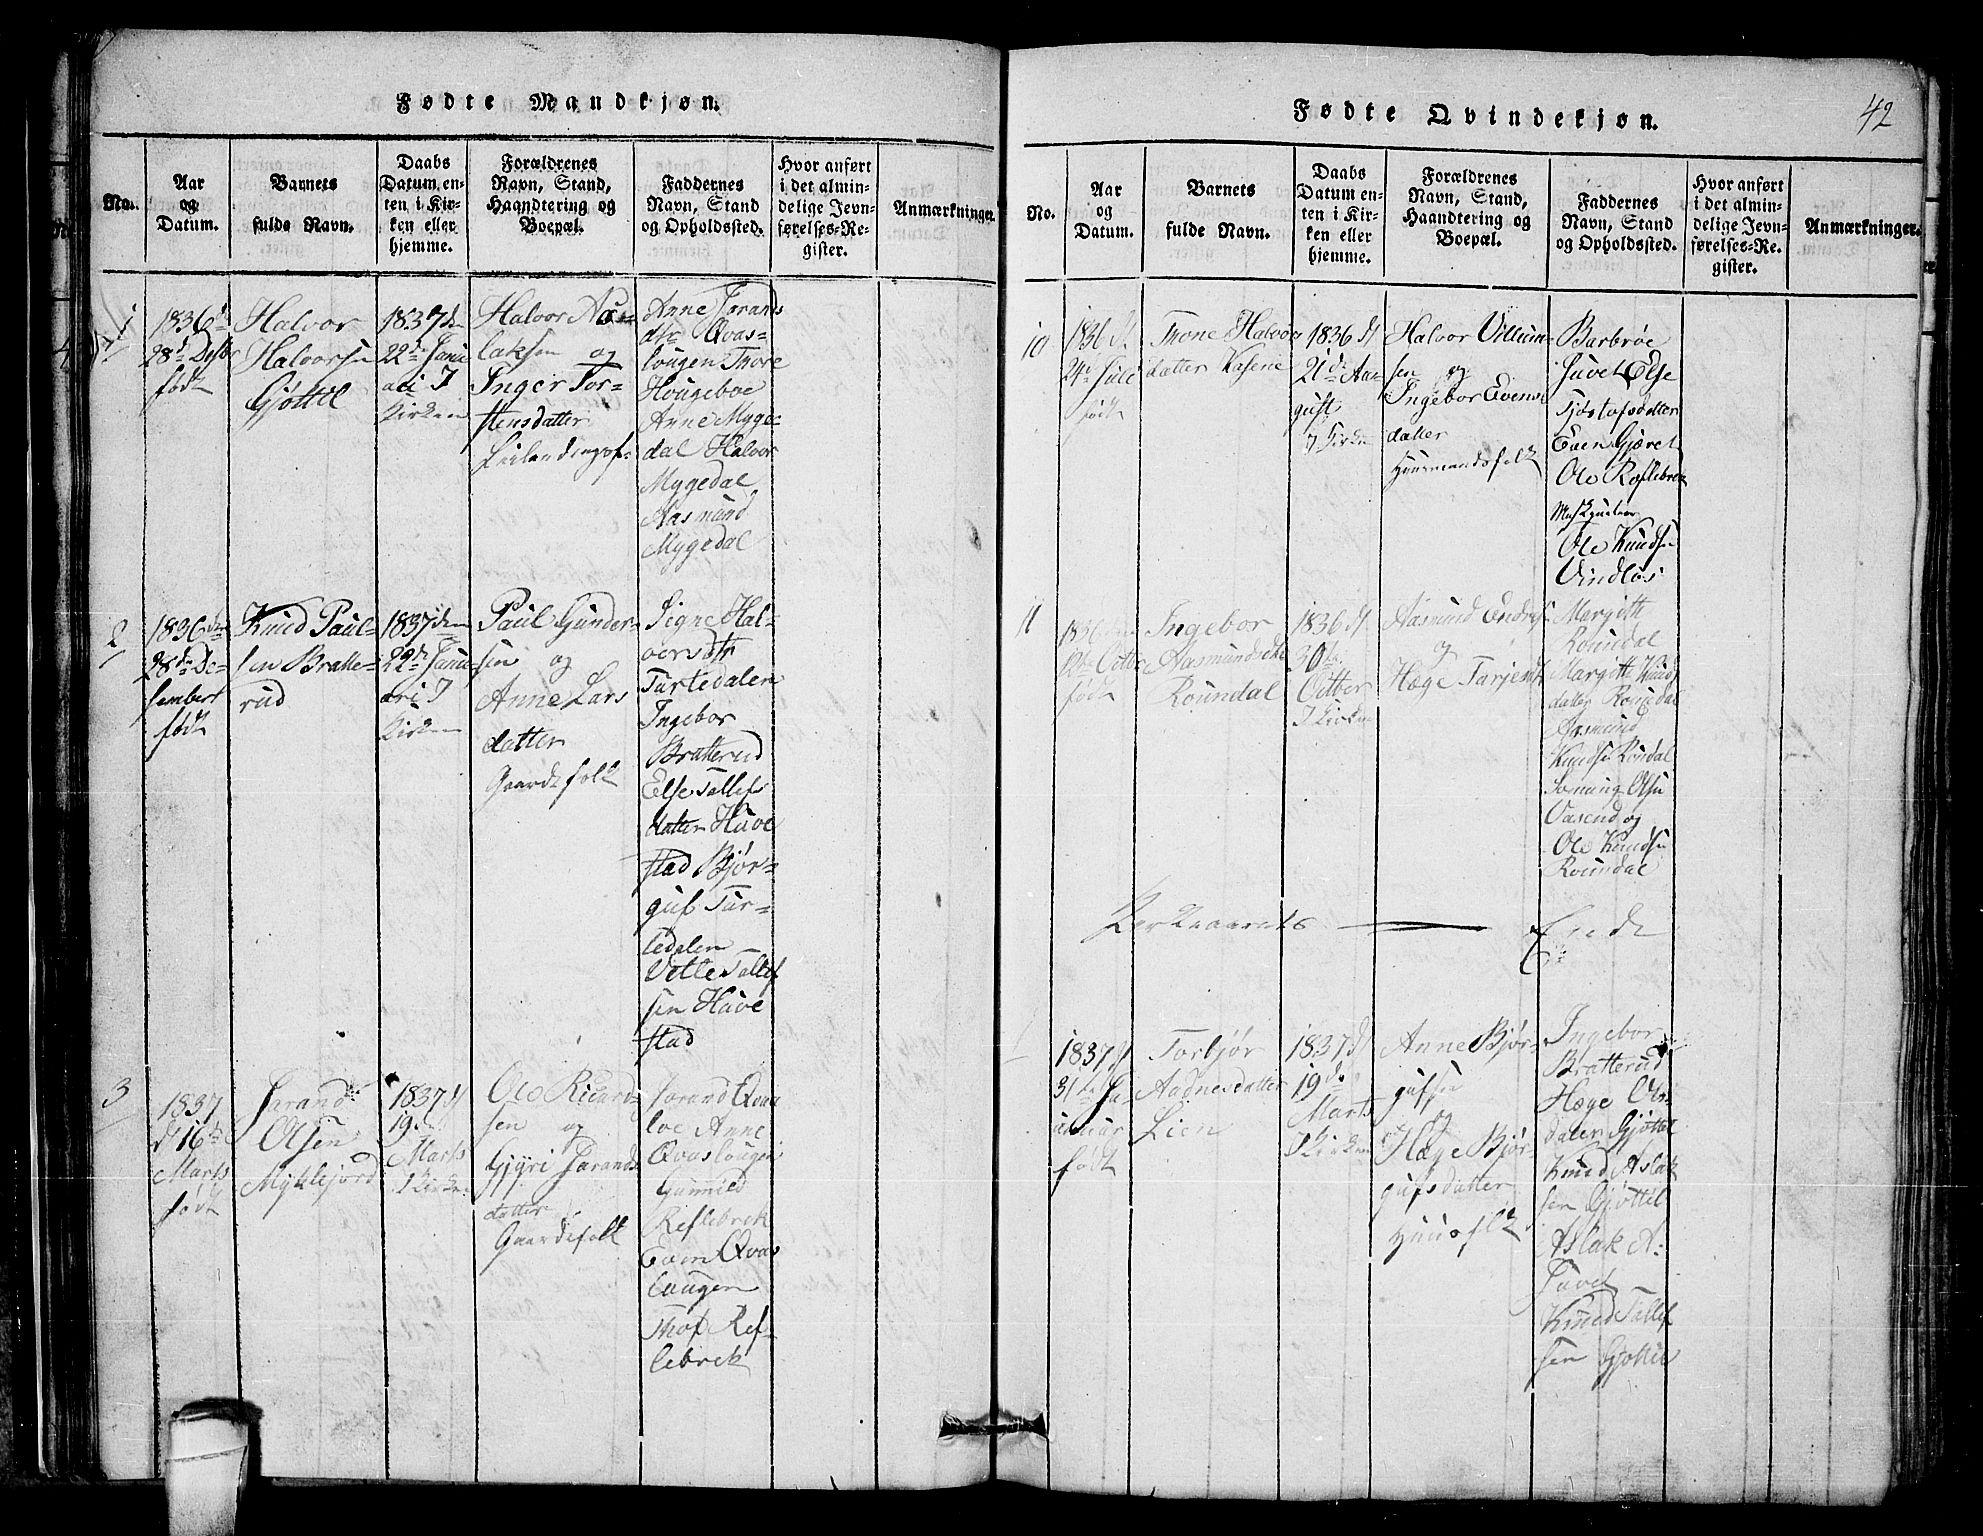 SAKO, Lårdal kirkebøker, G/Gb/L0001: Klokkerbok nr. II 1, 1815-1865, s. 42